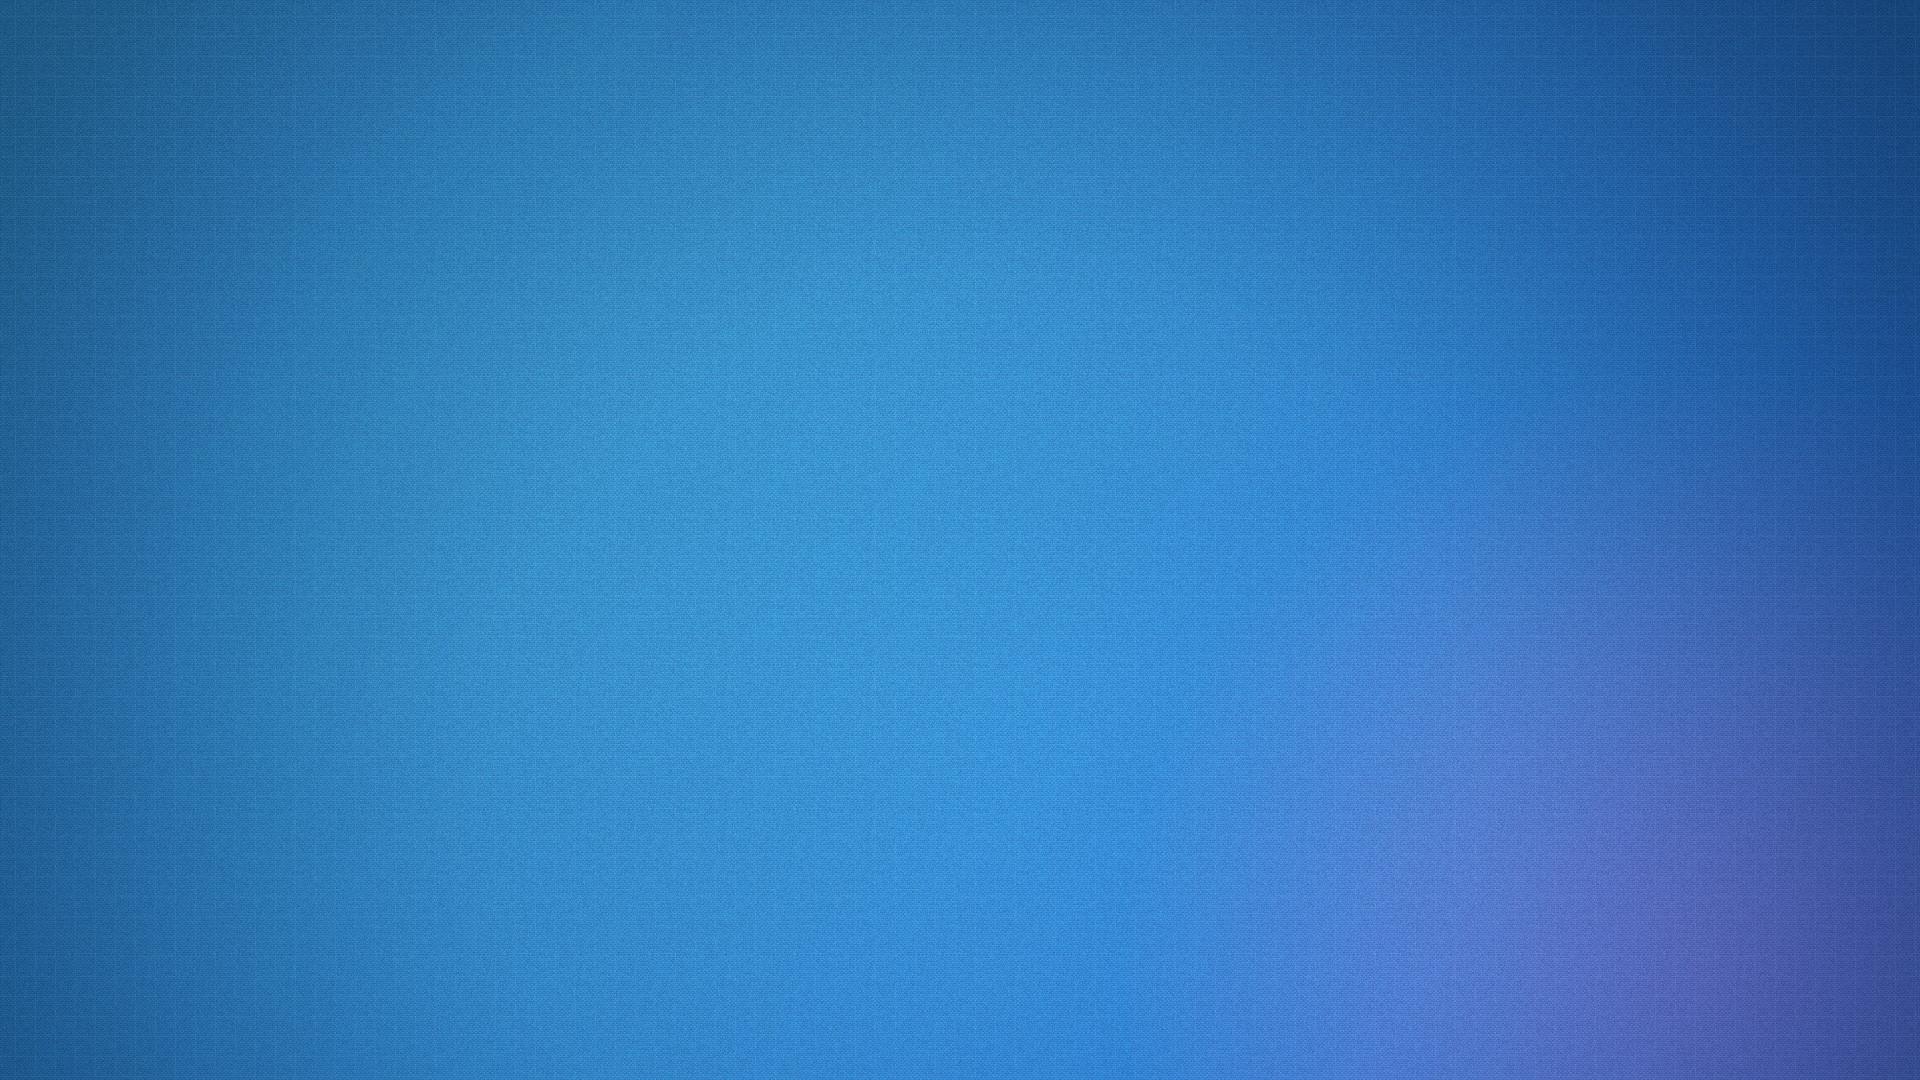 Plain Blue Screen Wallpaper 1920x1080 ·① WallpaperTag